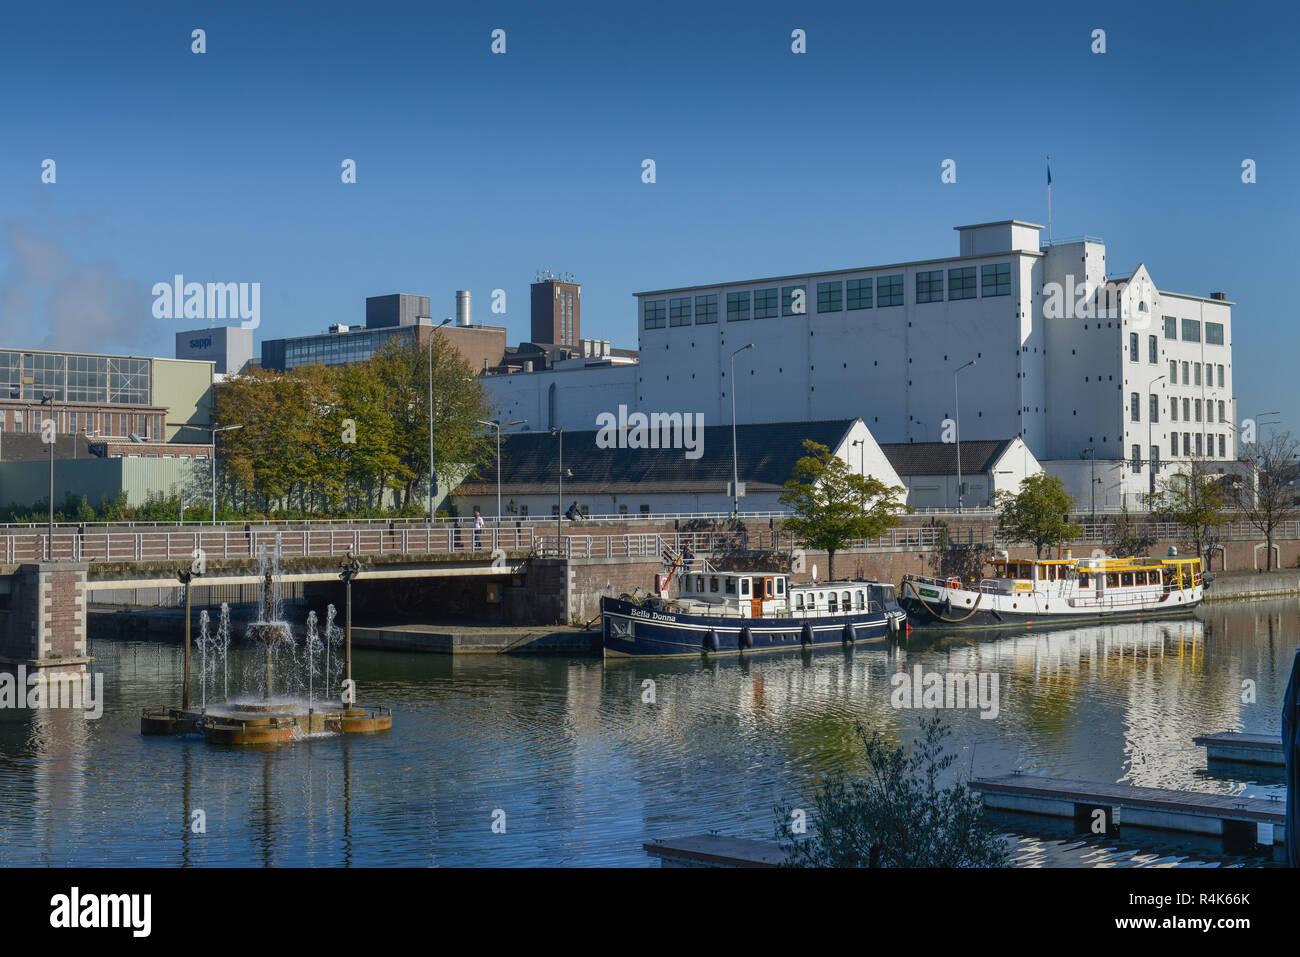 Inland harbour basin, Maastricht, the Netherlands, Binnenhafen Bassin, Niederlande - Stock Image